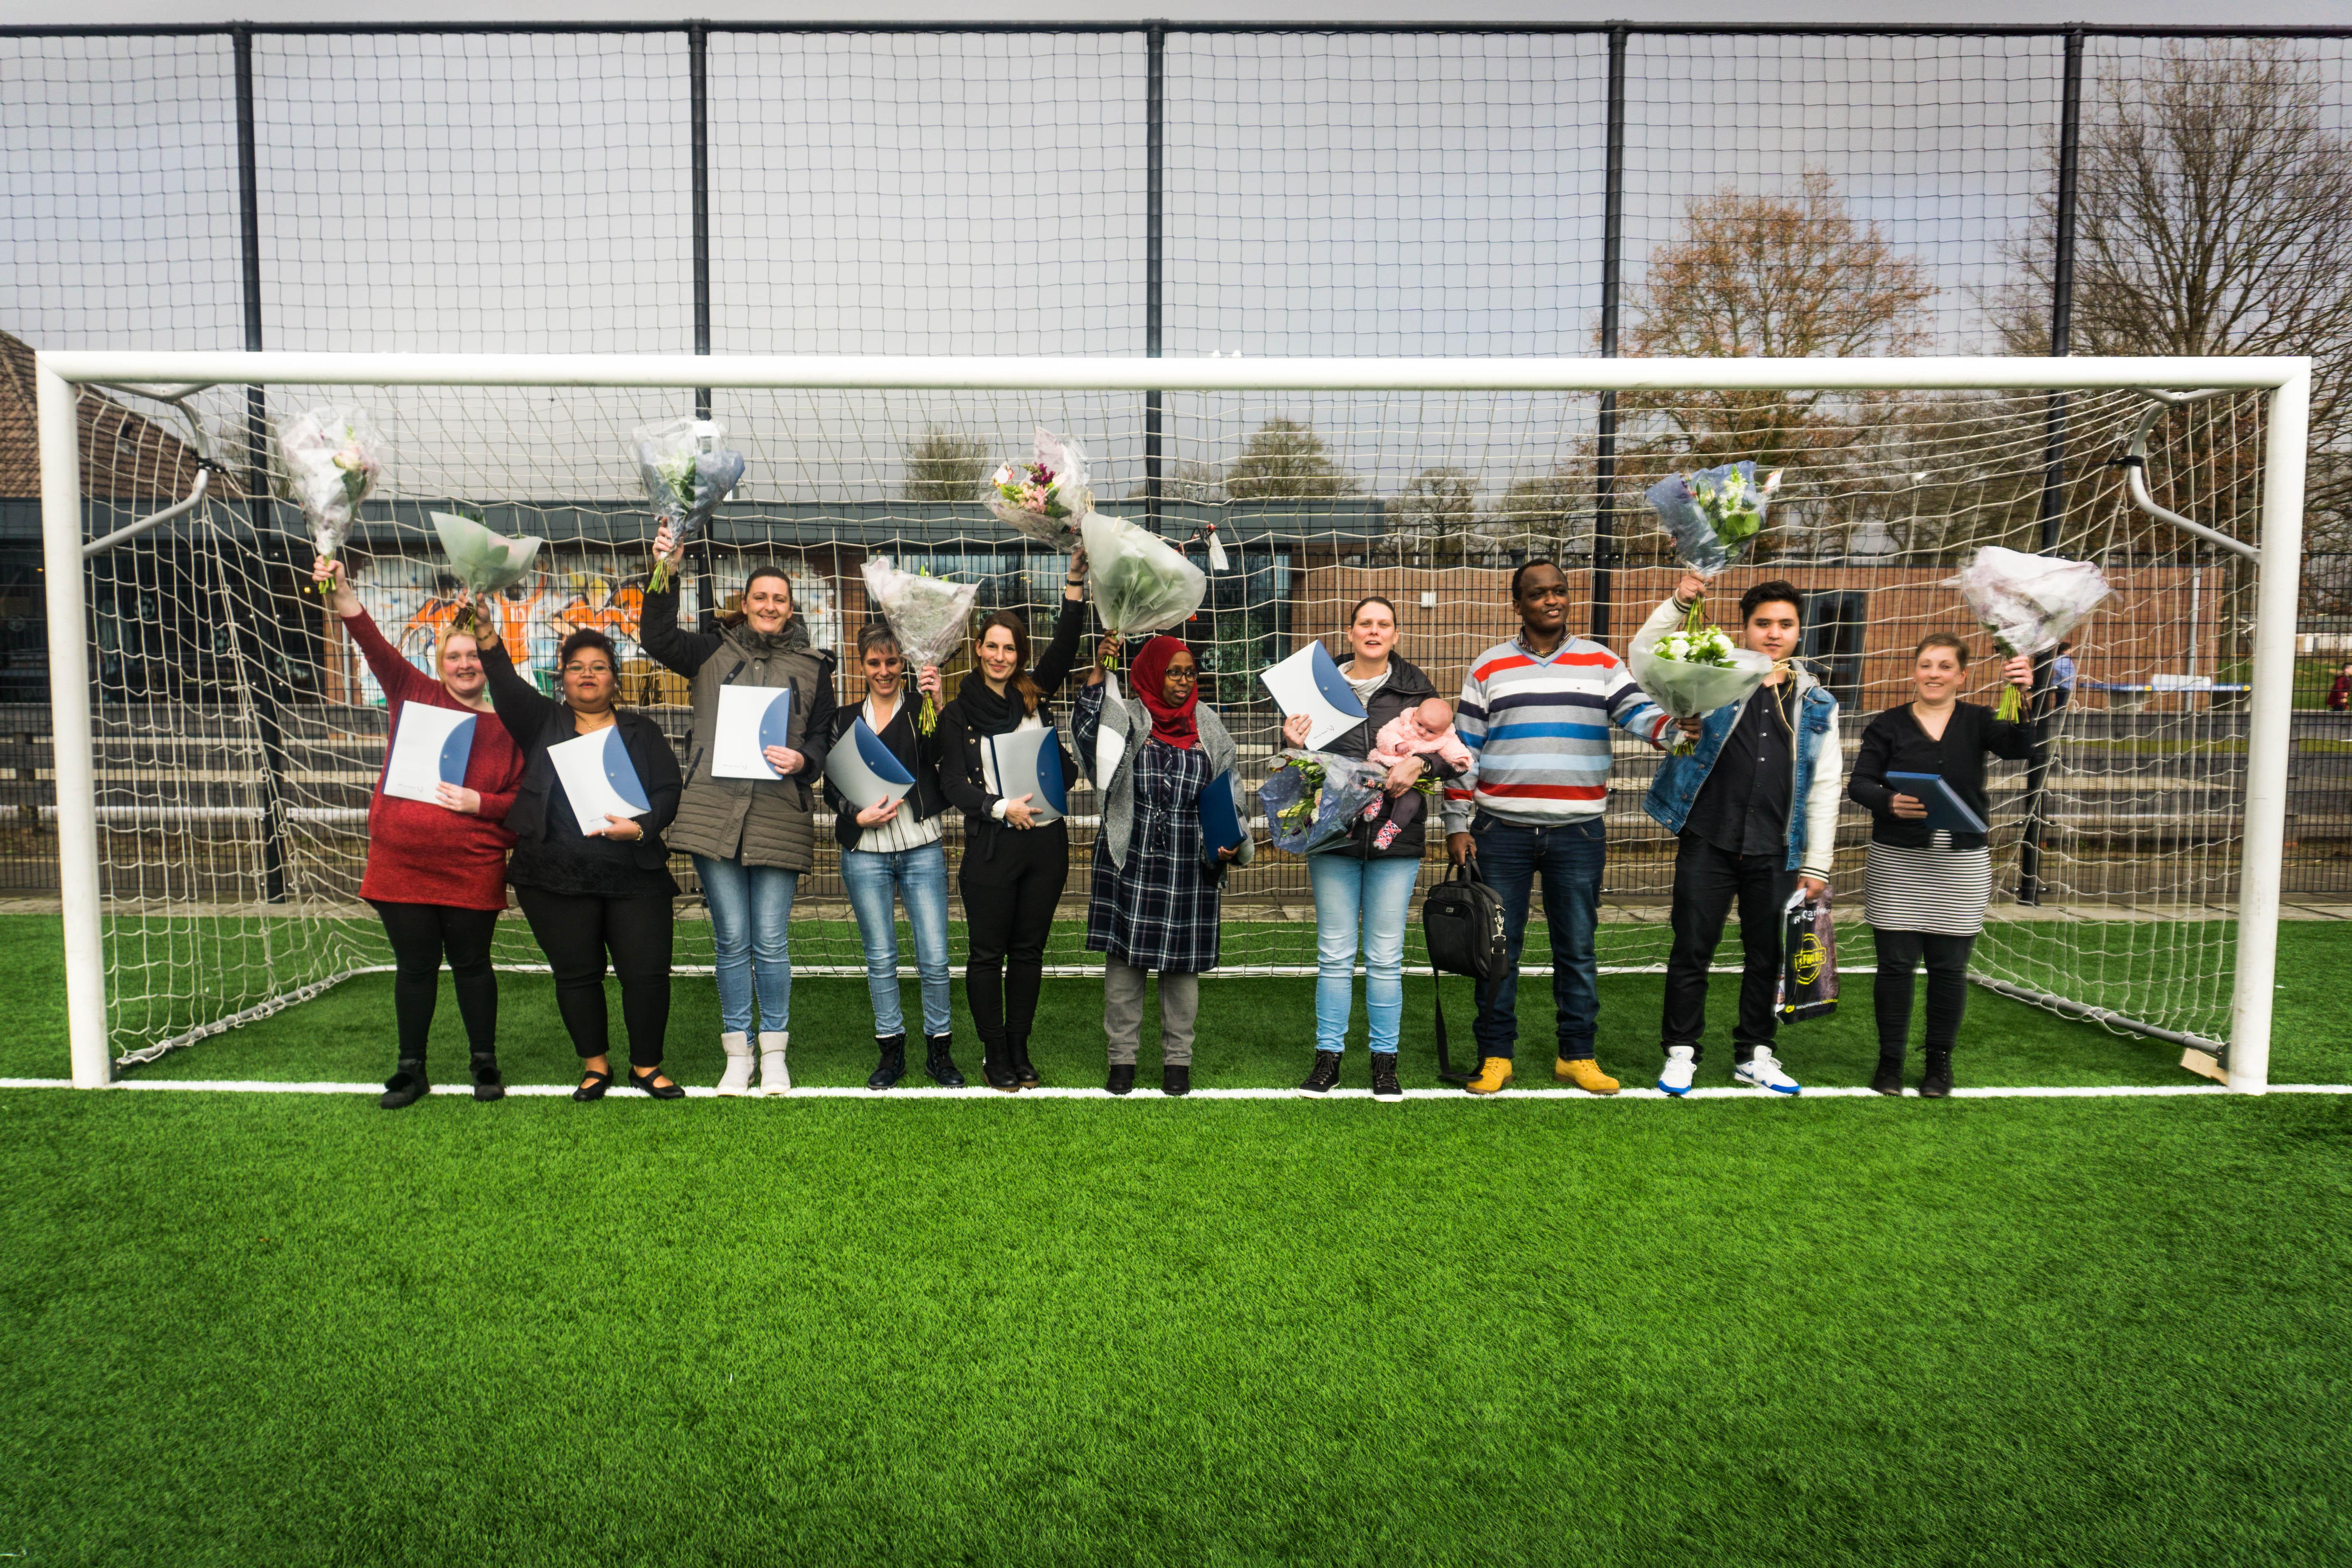 Studenten Scoren Diploma Bij Sportvereniging!